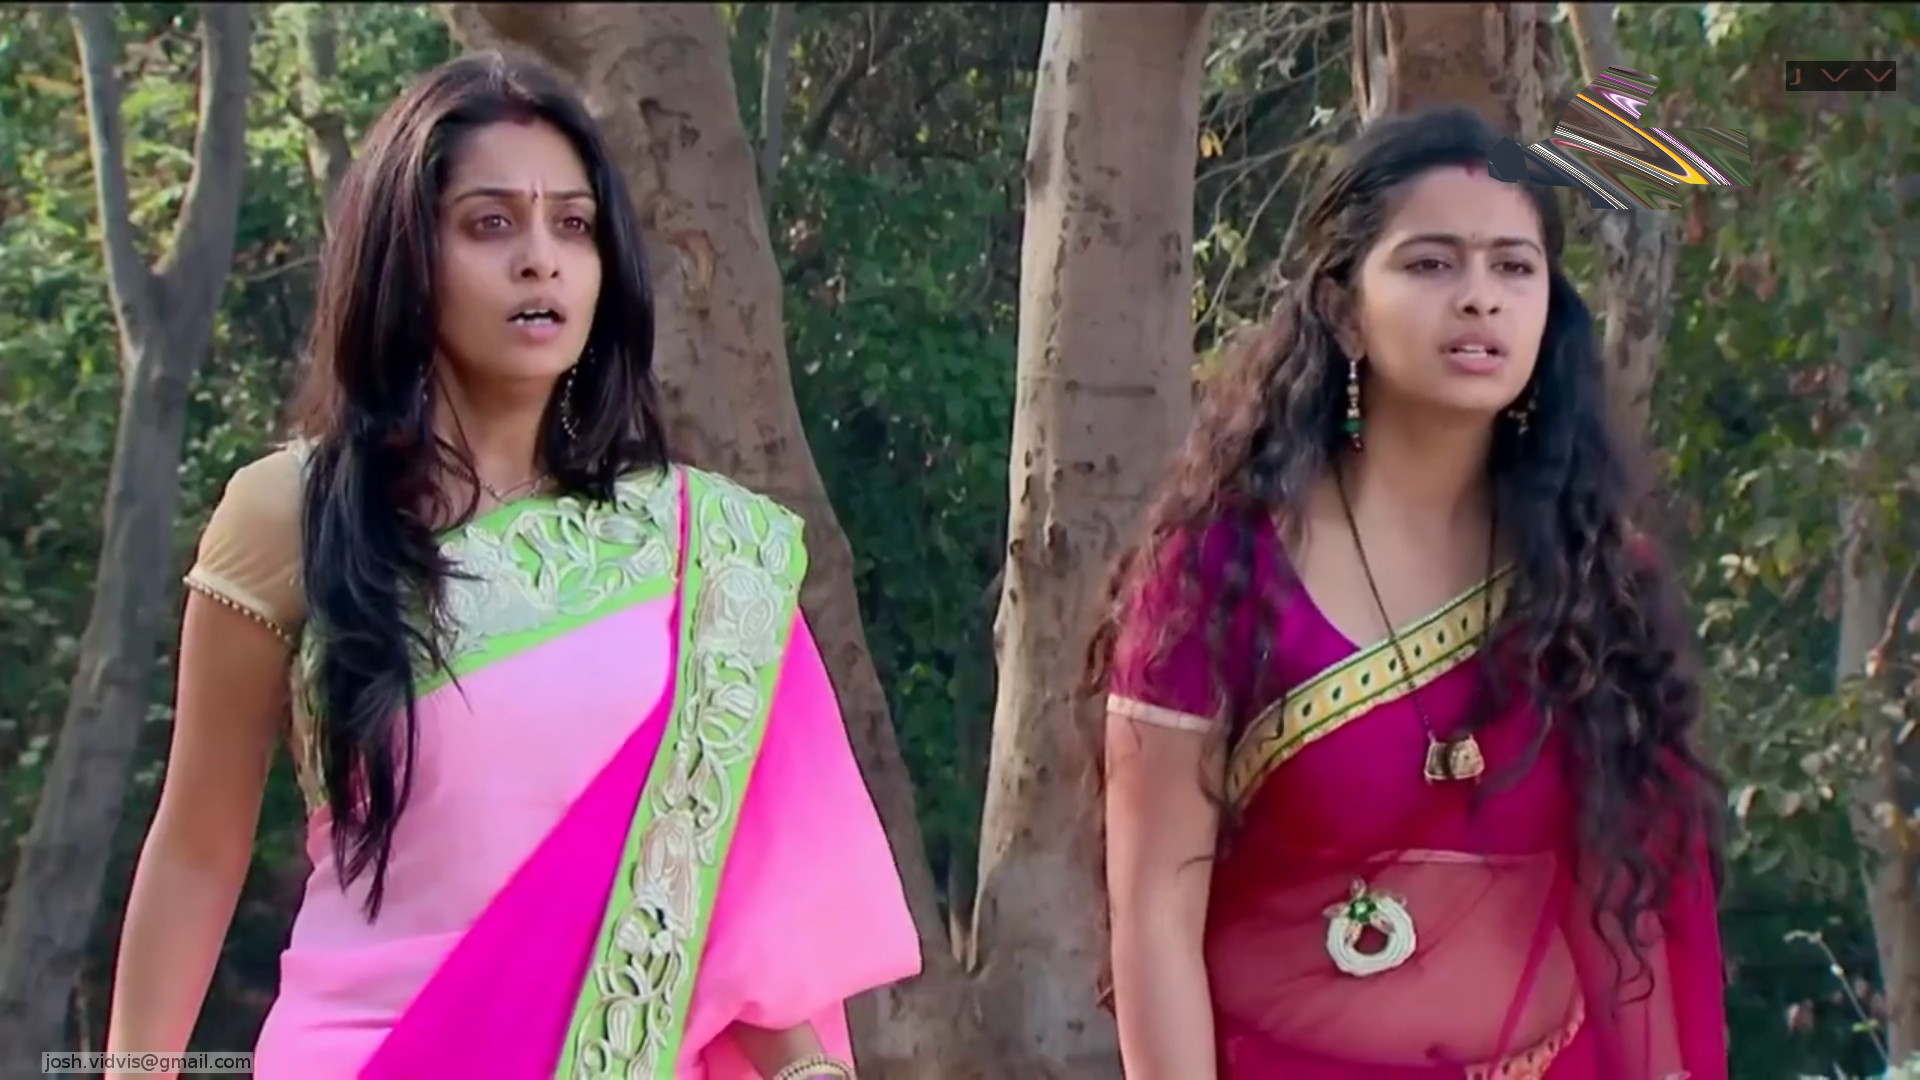 Avika Gor 3_Sasural Simar ka_05 – Indian Telly Show  Avika In Sasural Simar Ka